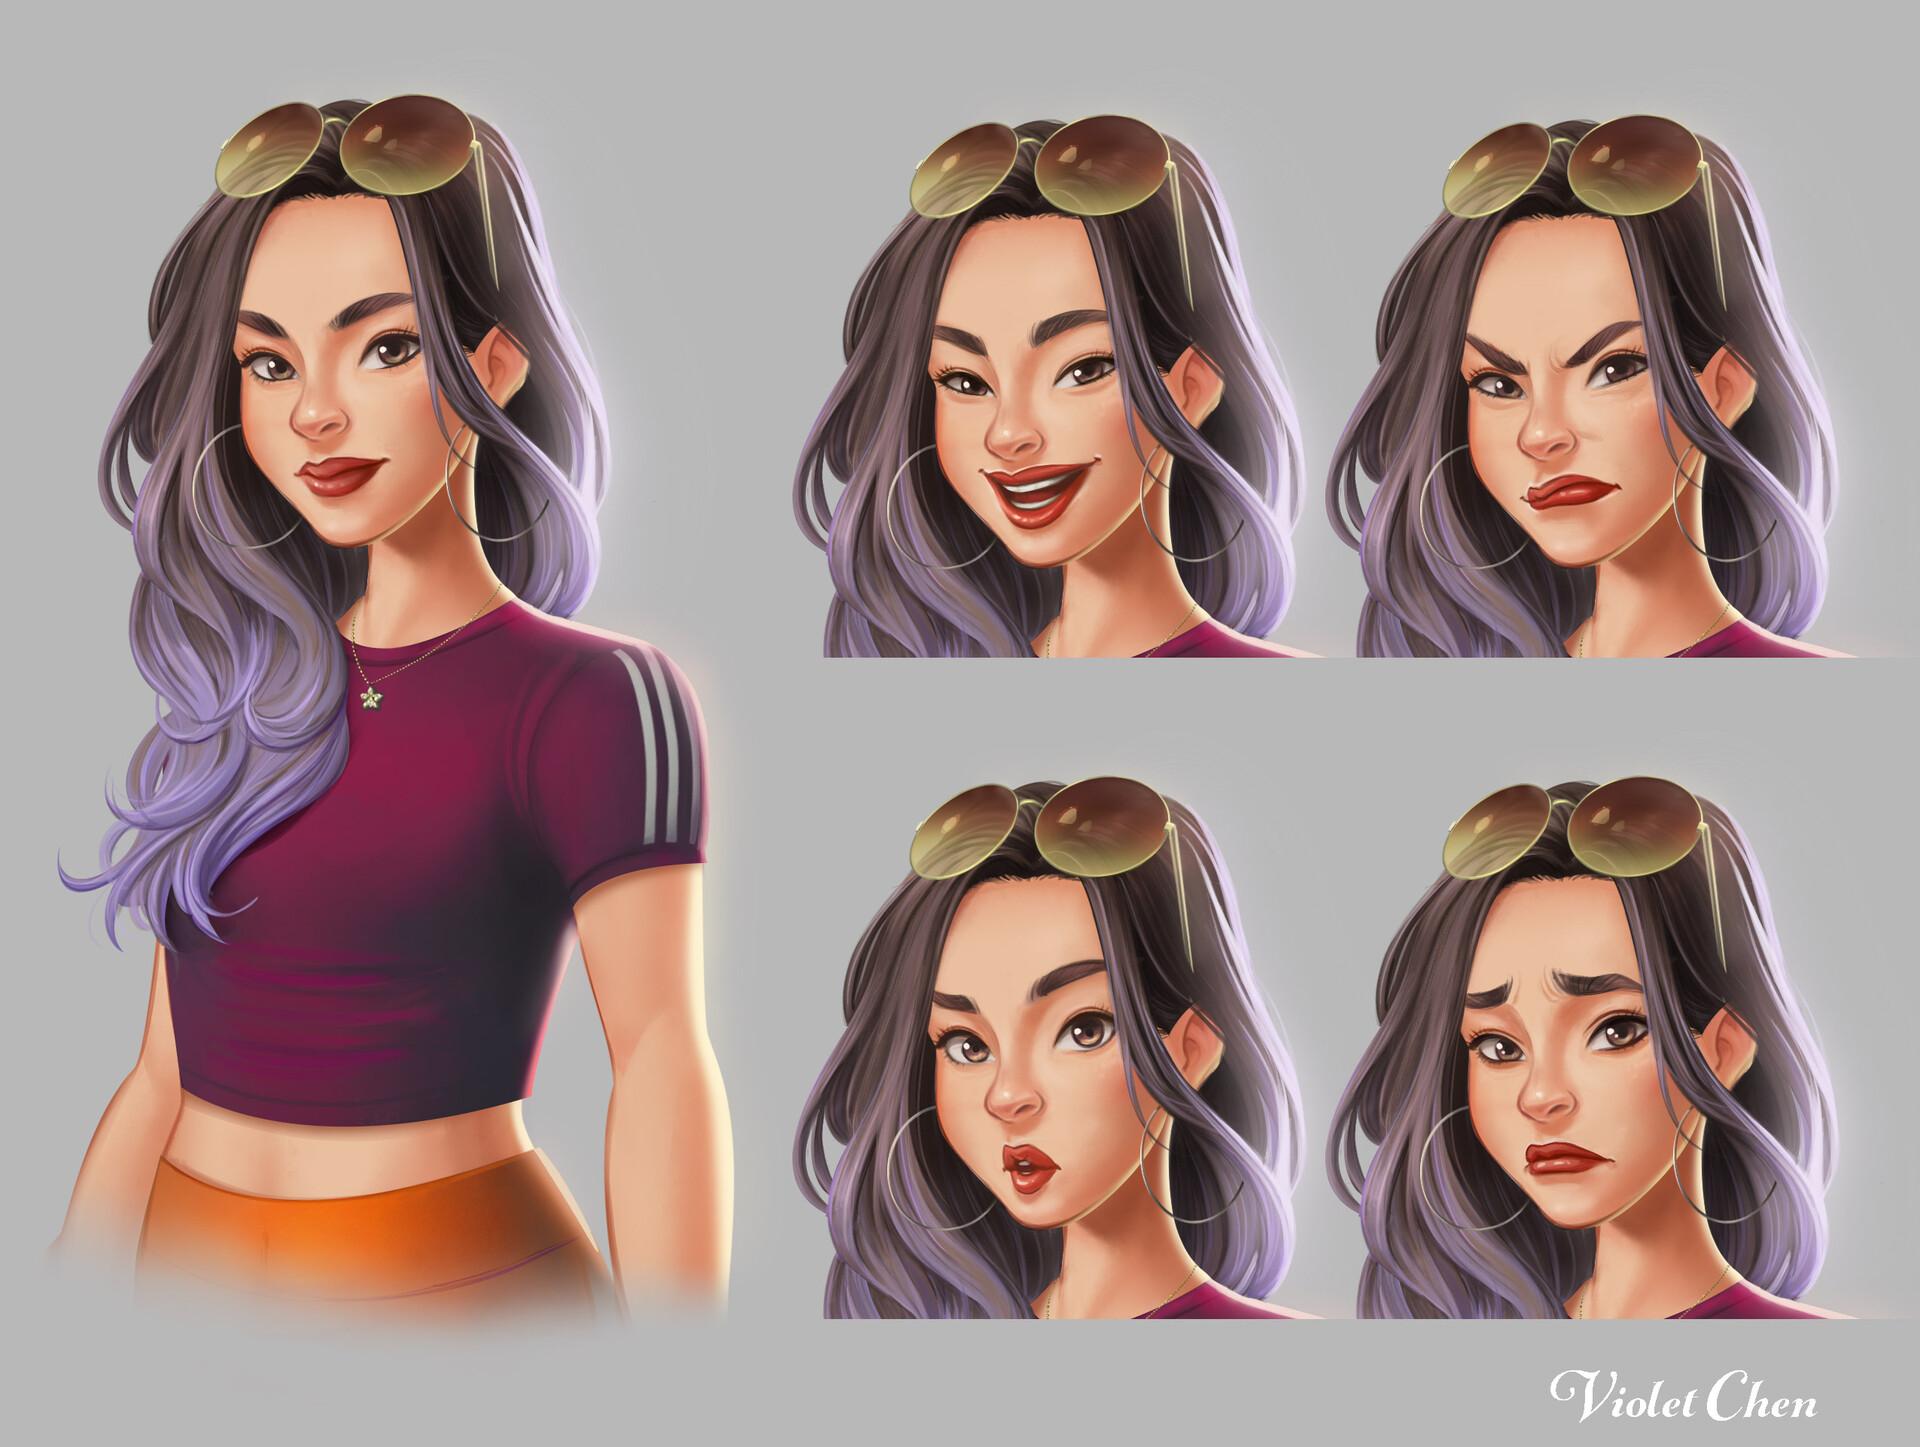 Character Art: Violet